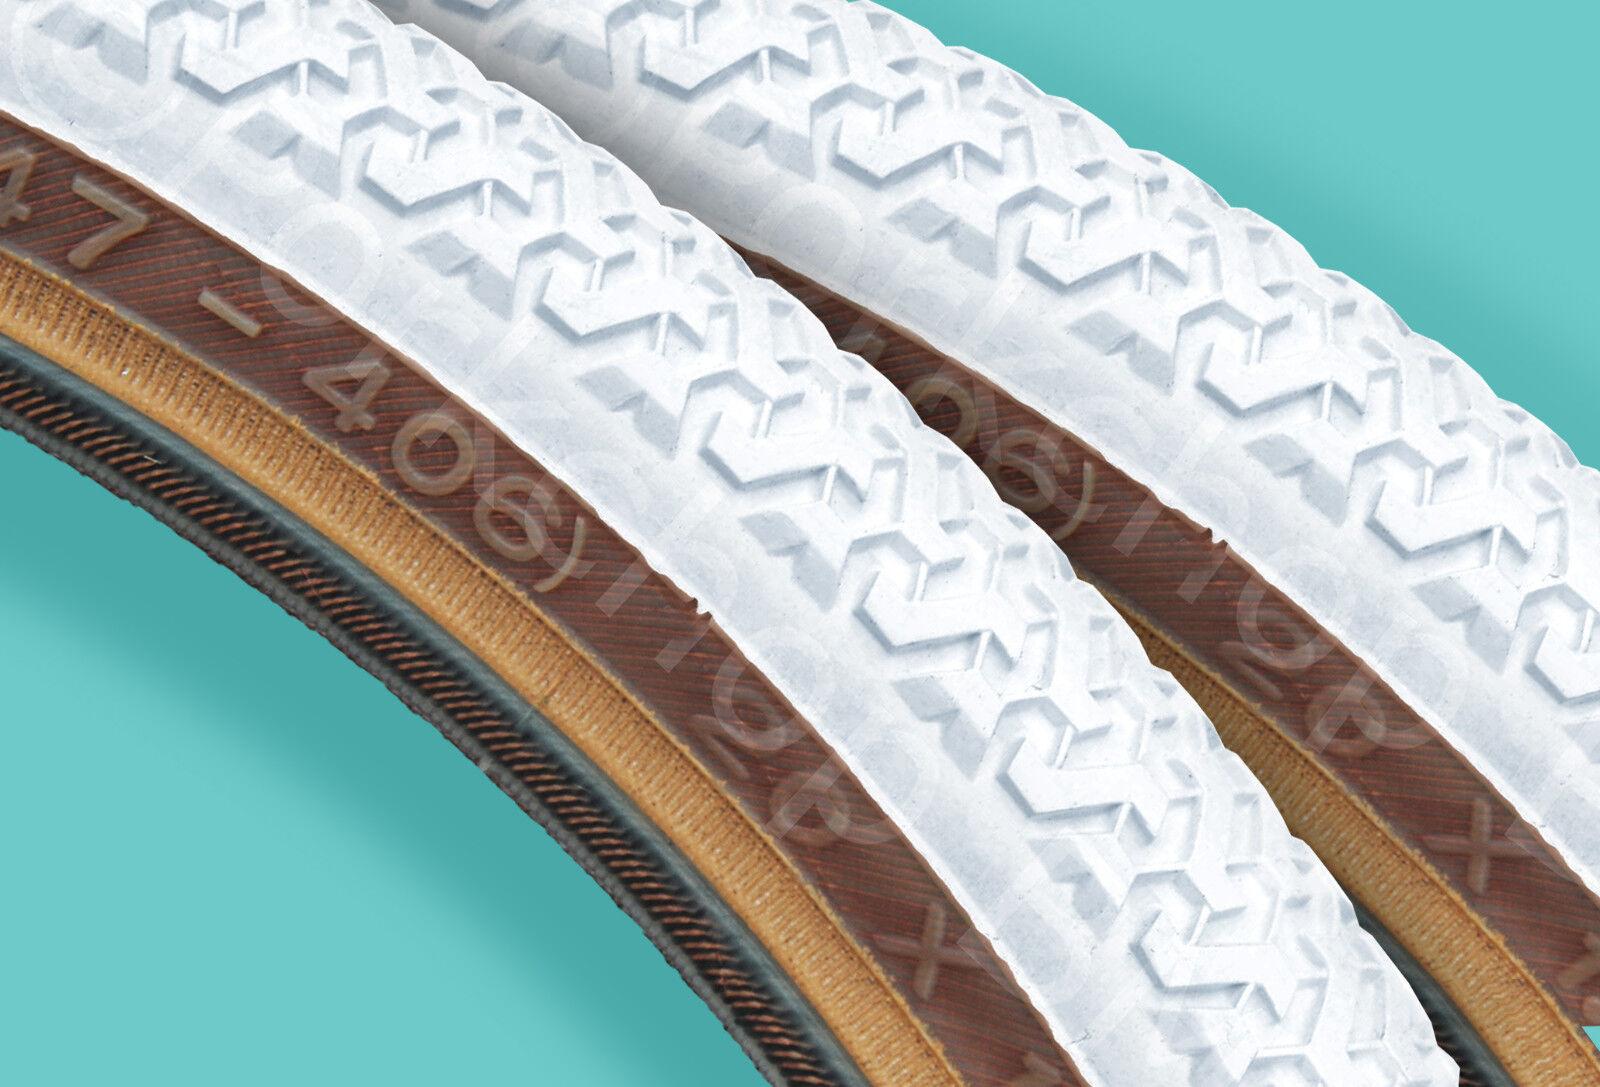 Kenda K55 freestyle old school BMX skinwall gumwall tires PAIR 20  X 1.75  WHITE